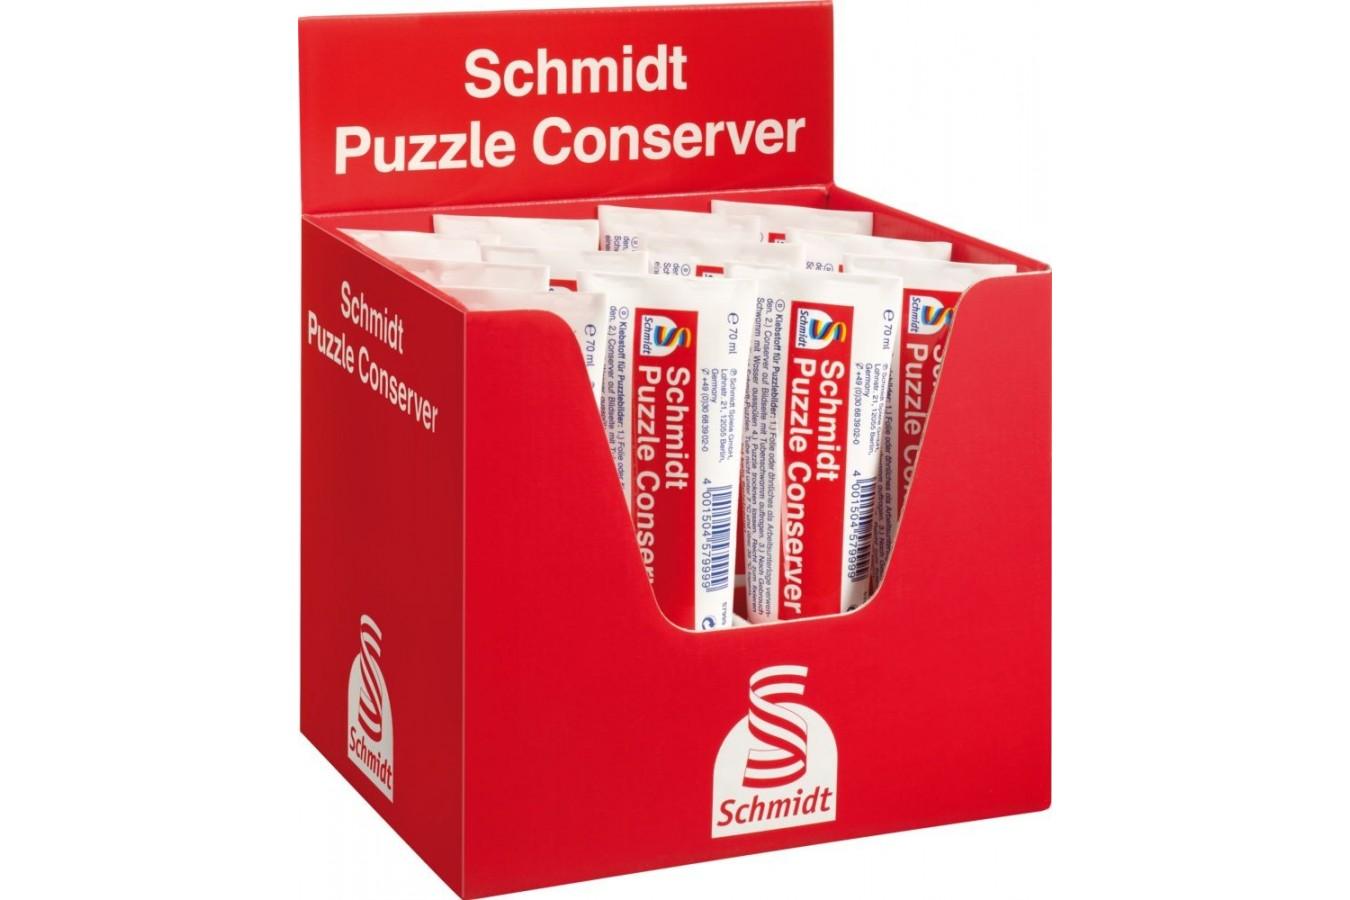 Adeziv pentru puzzle Schmidt 70ml / 2000 piese